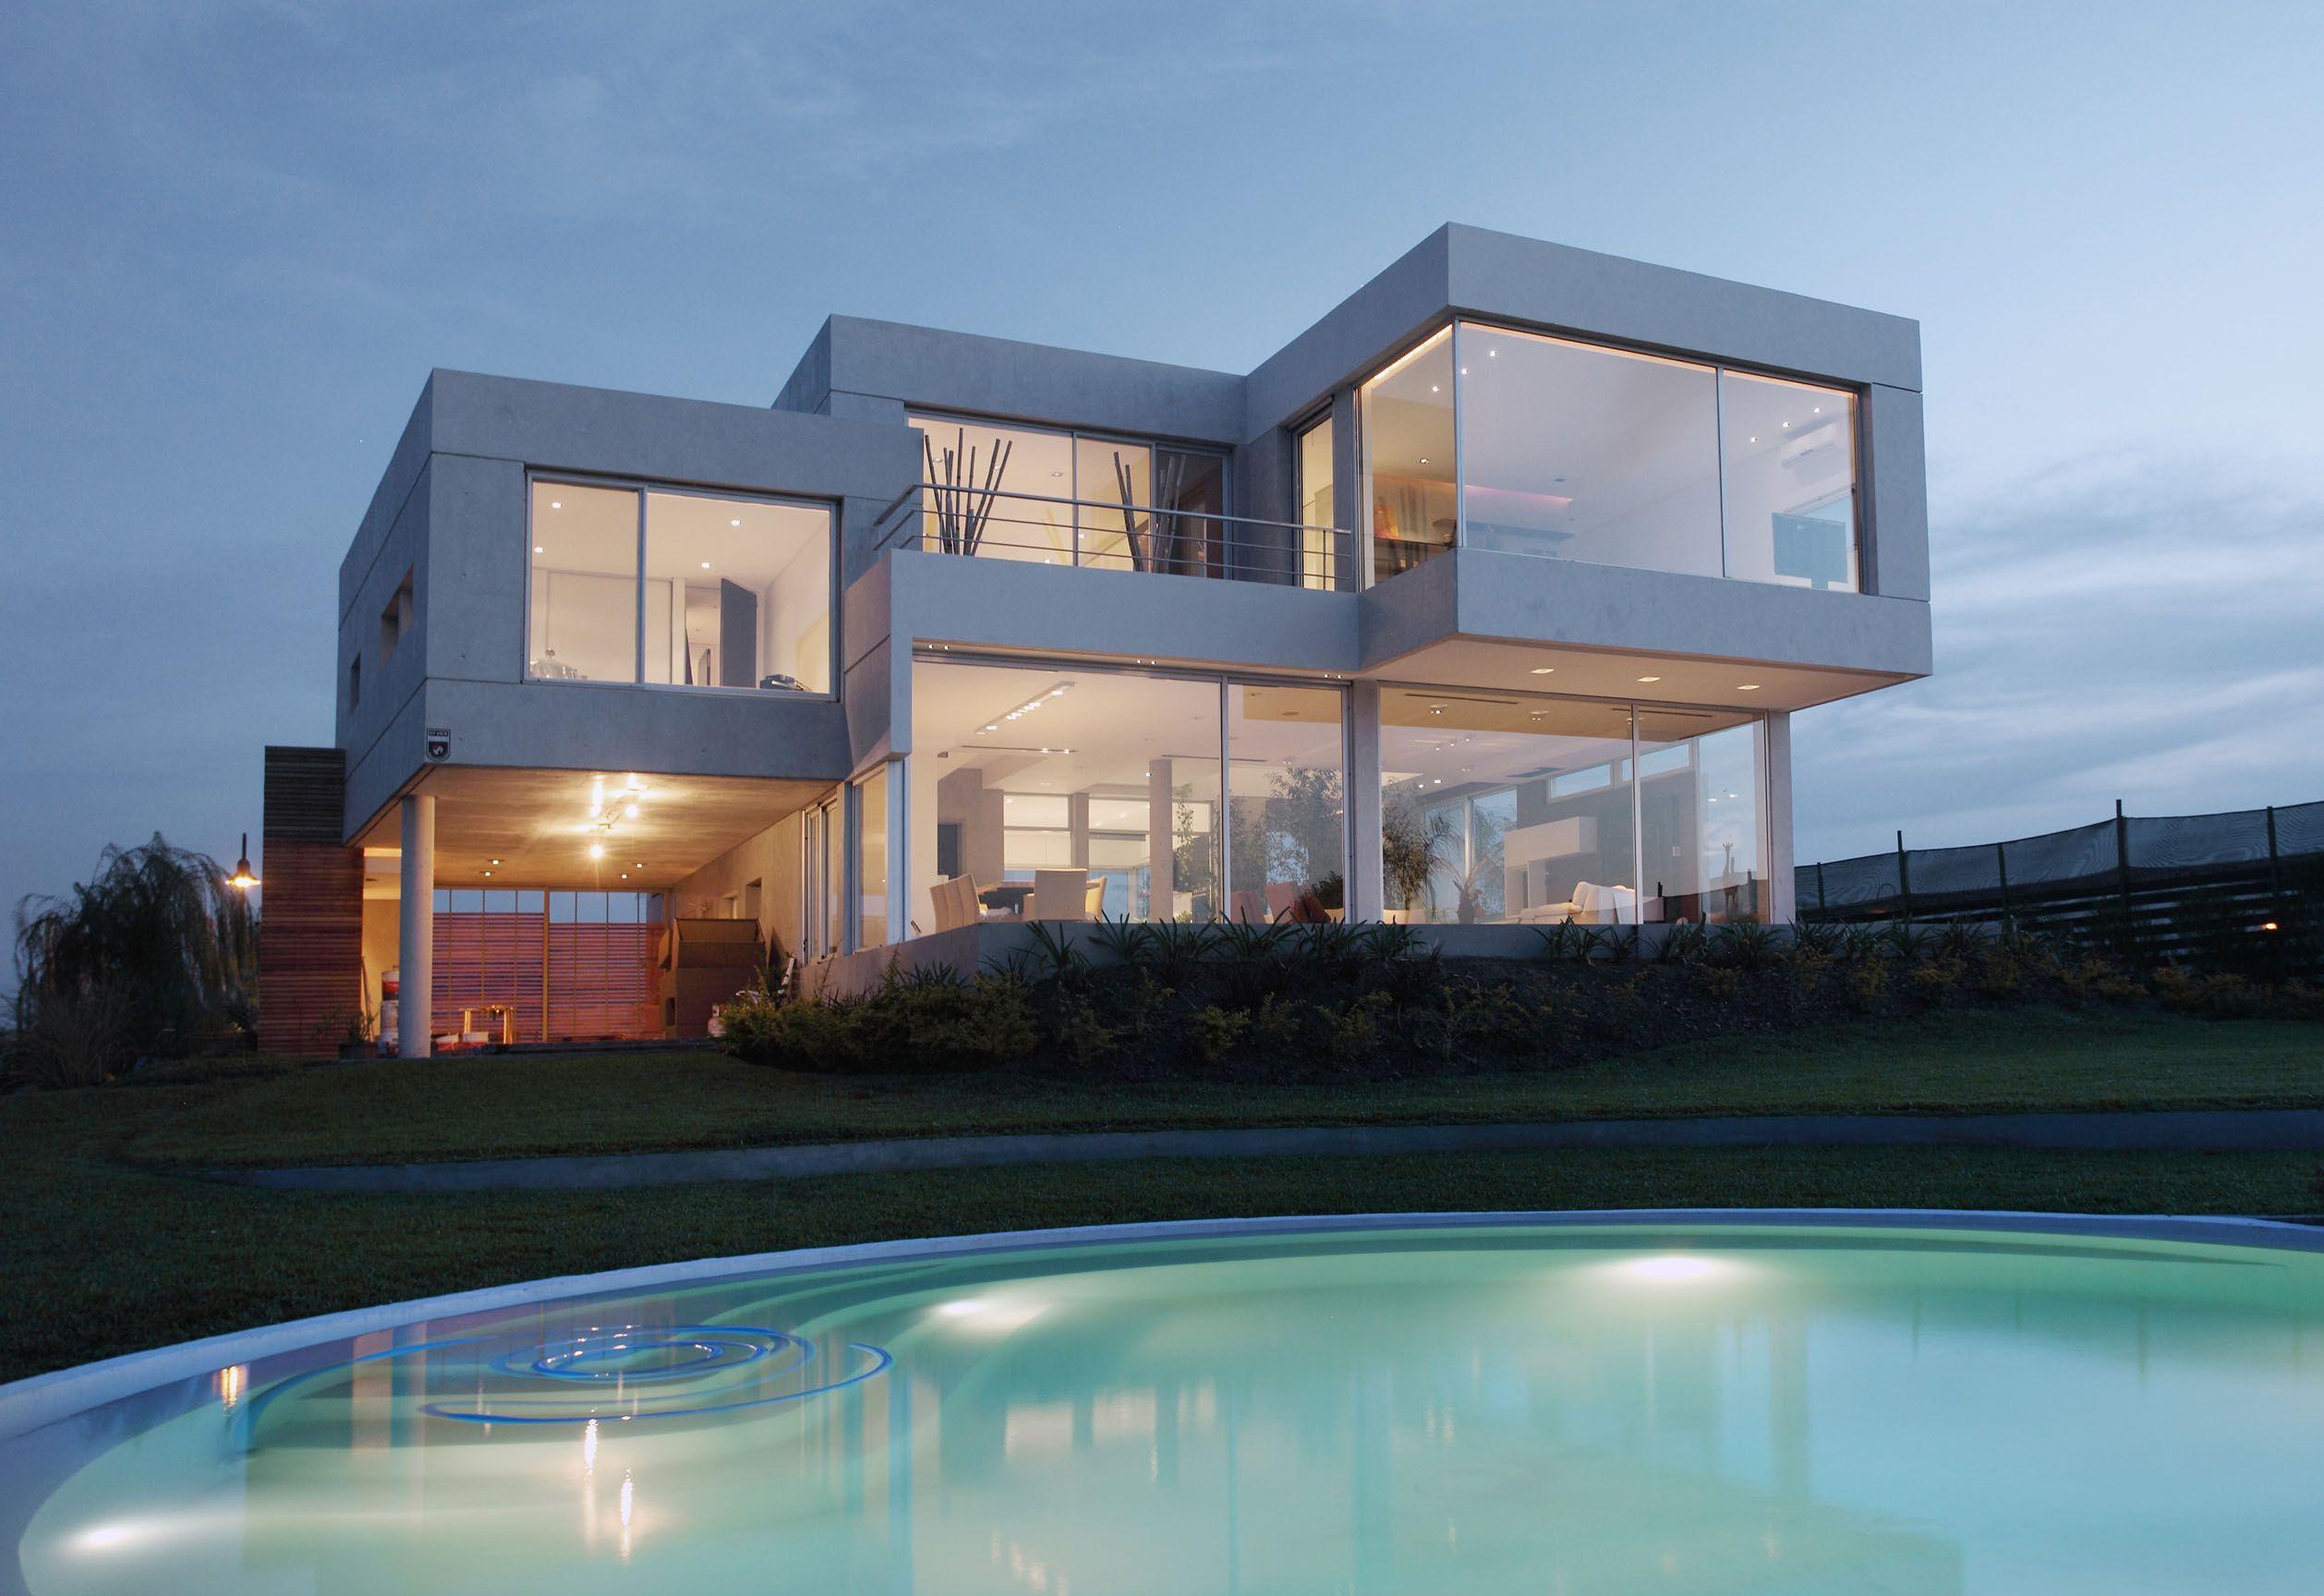 Modern Exterior House Design With Grand Designs Eco Friendly